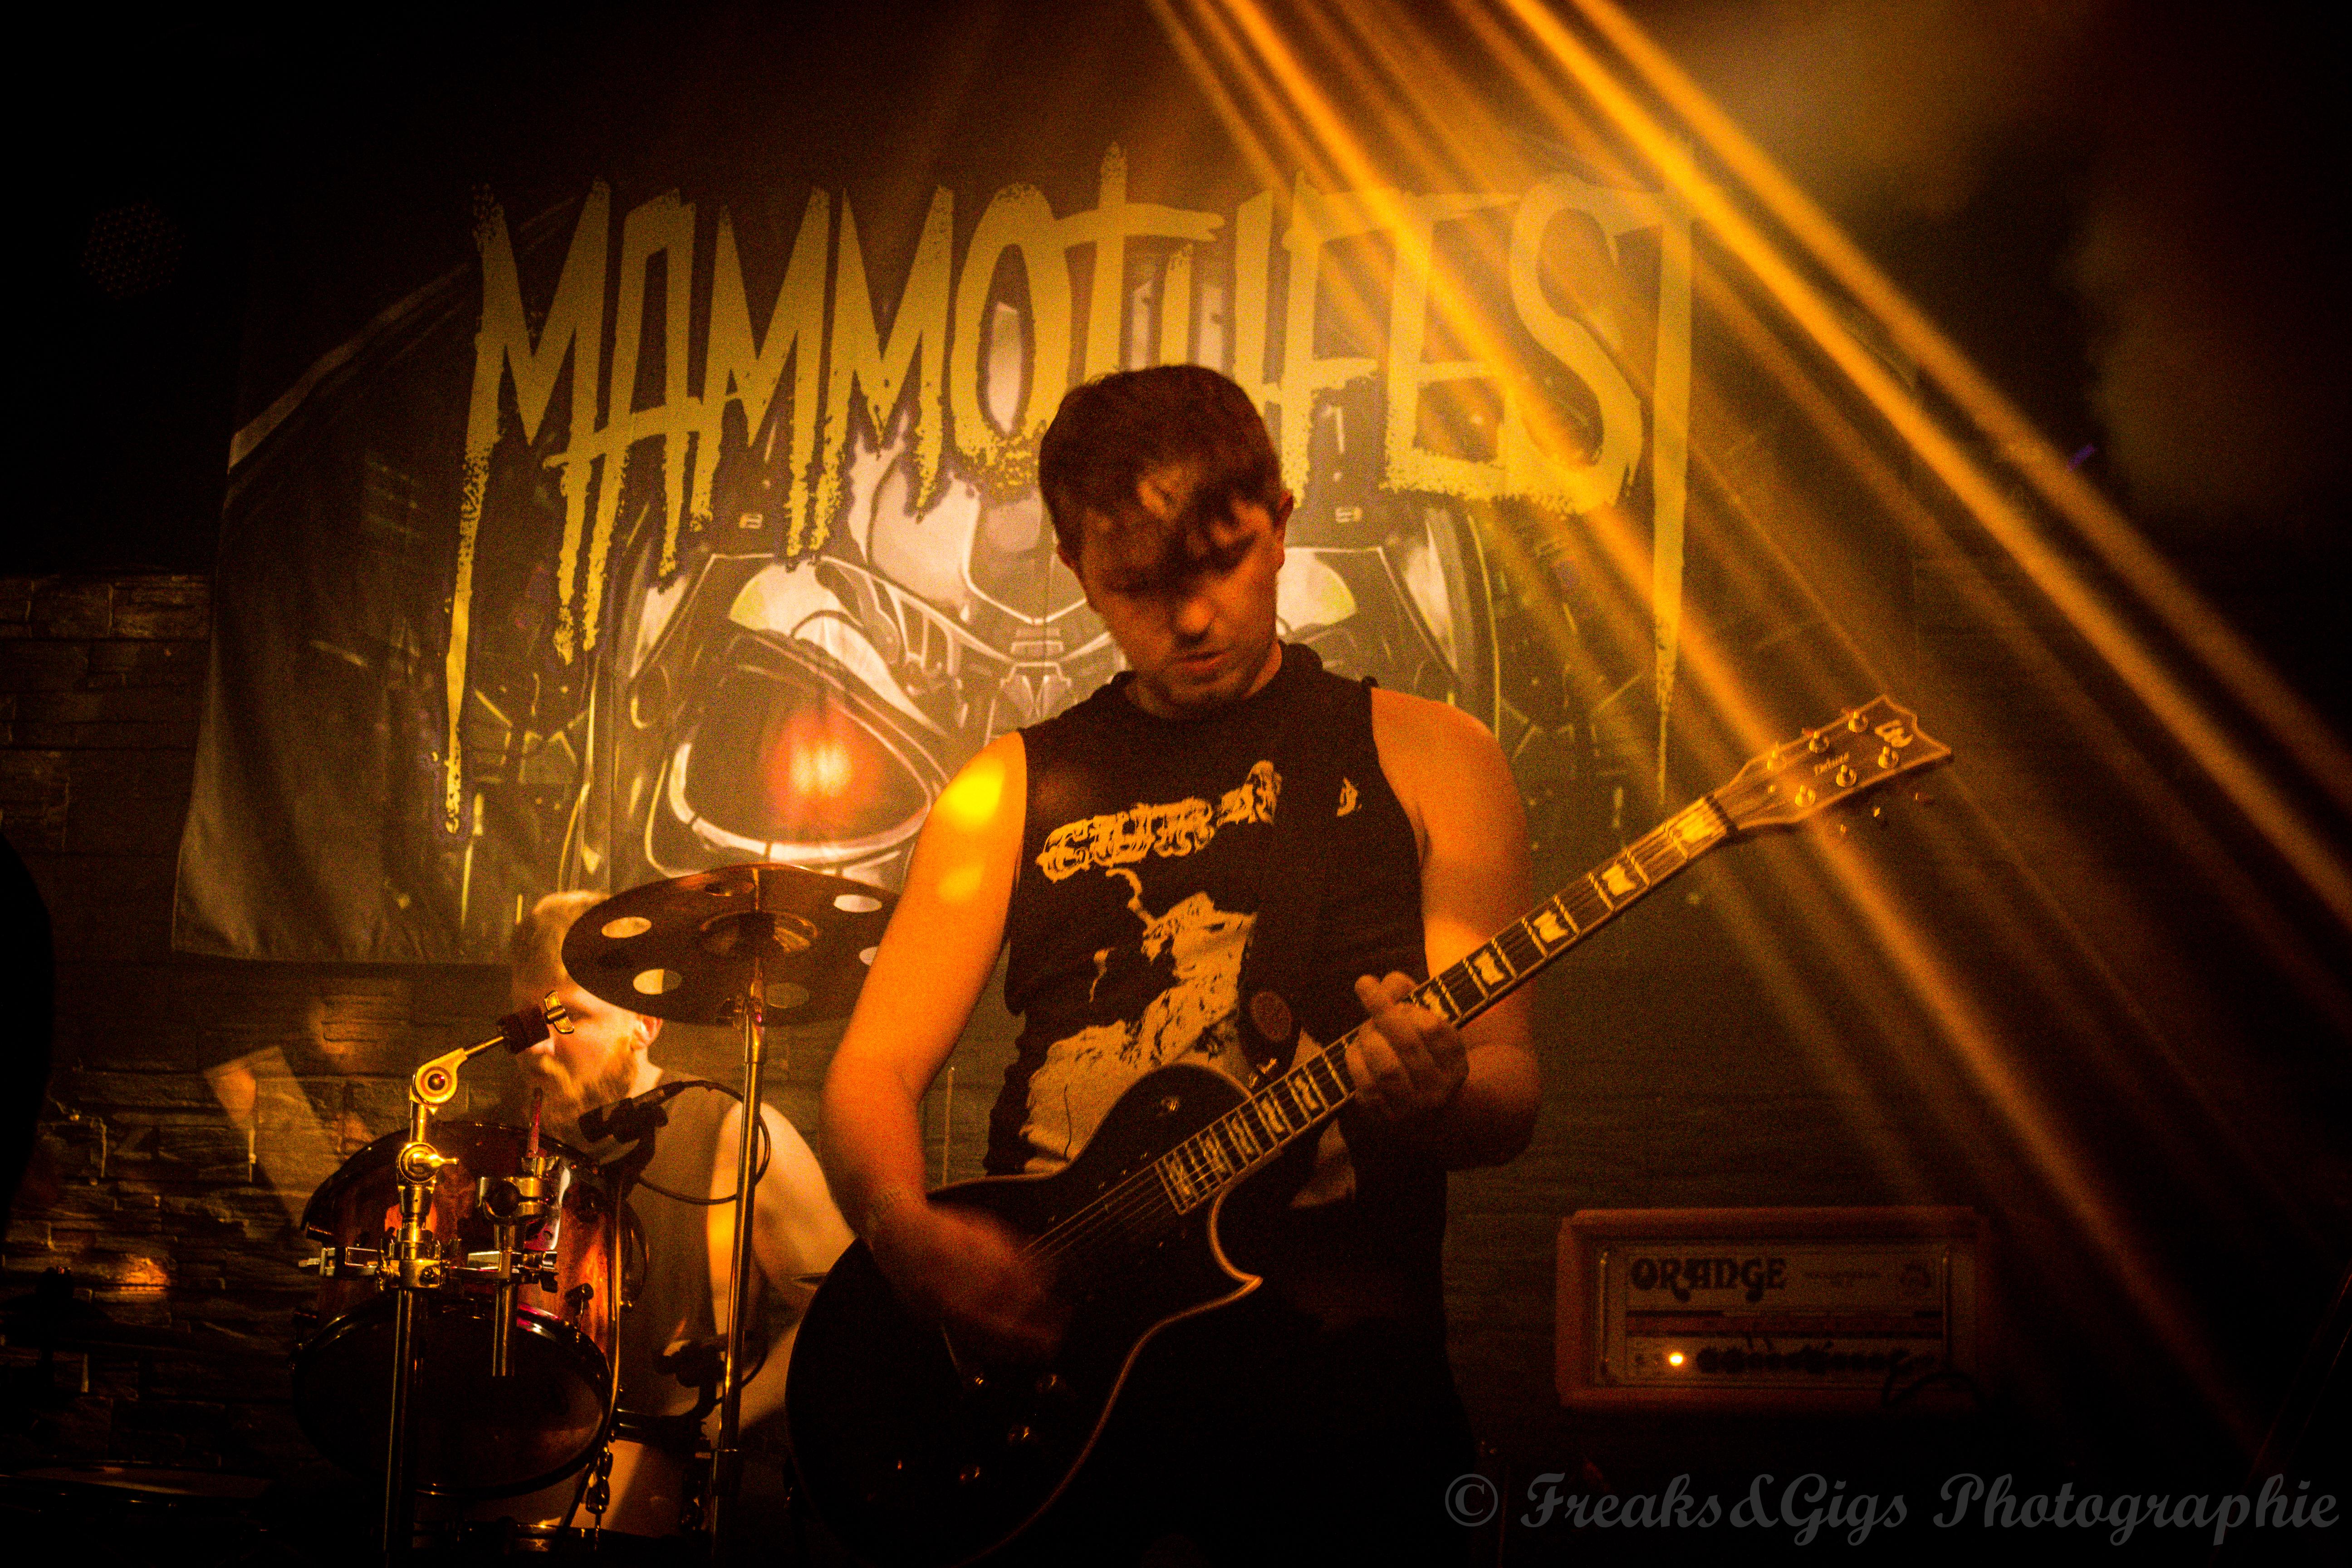 [Mammothfest 2017] Telepathy